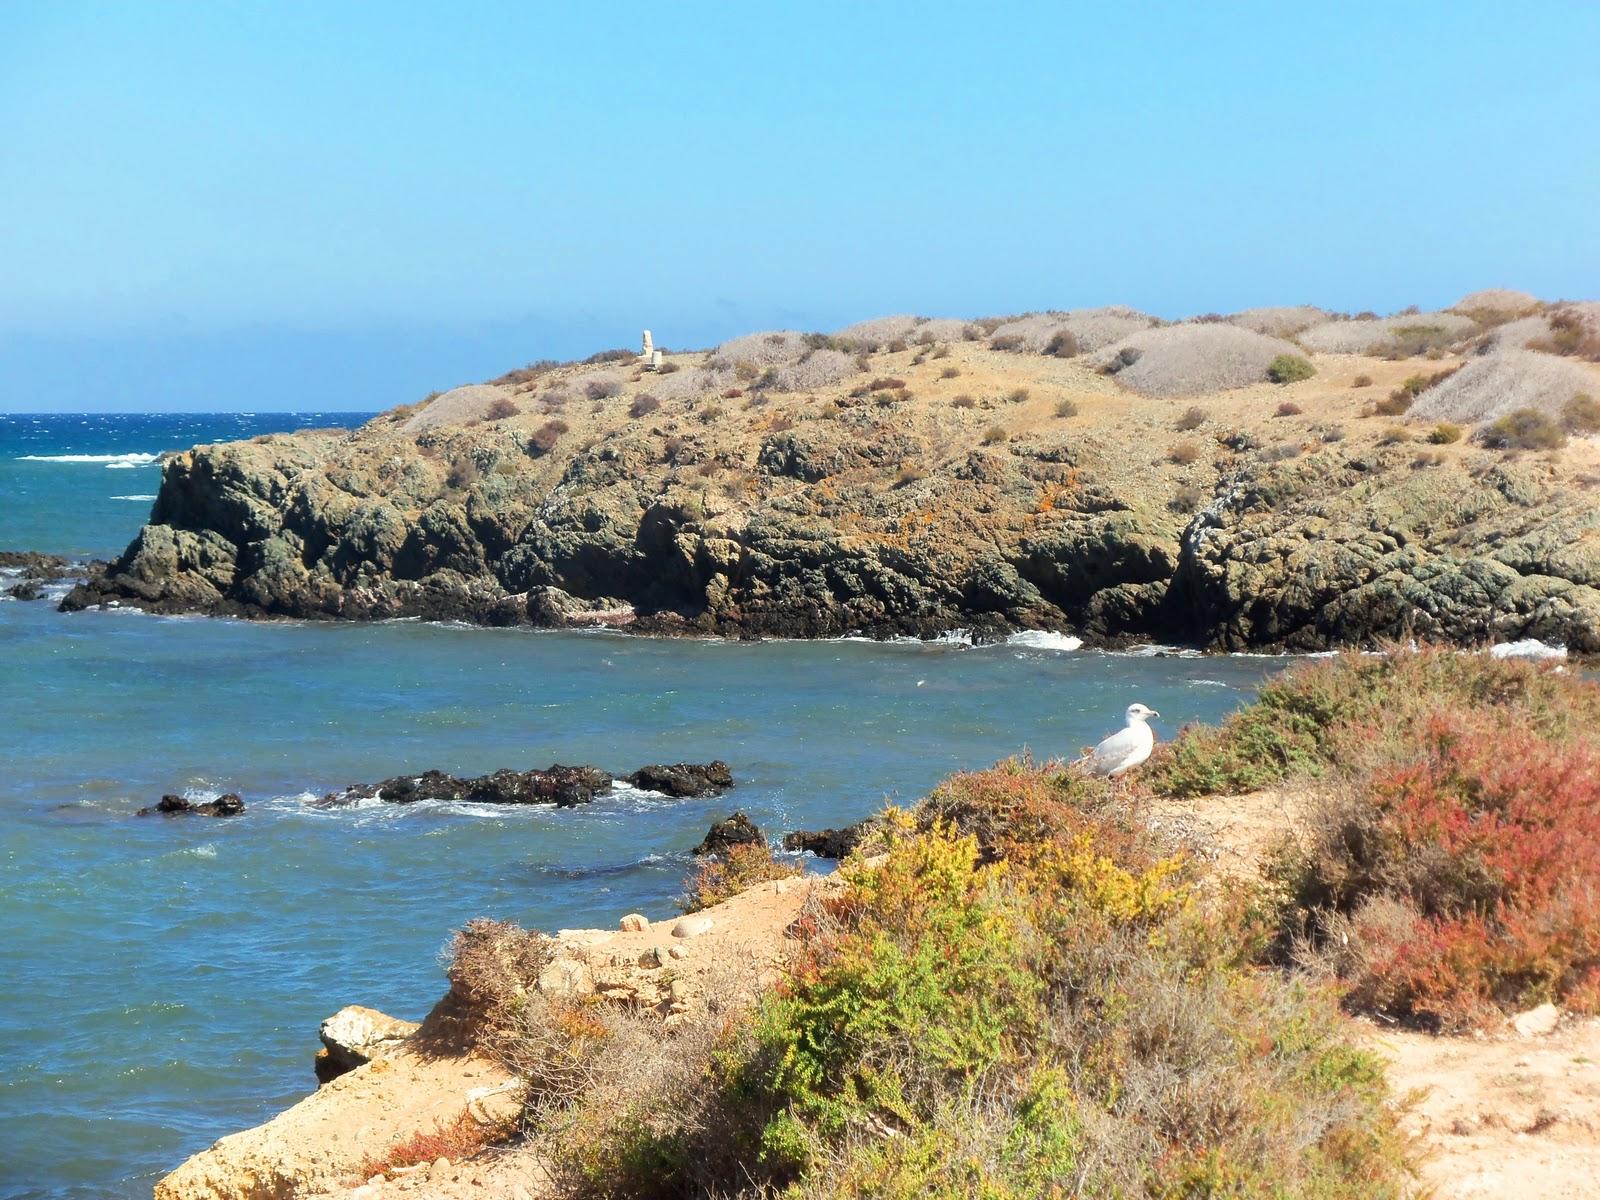 La ondina inquieta la isla de tabarca - Residencial isla tabarca ...